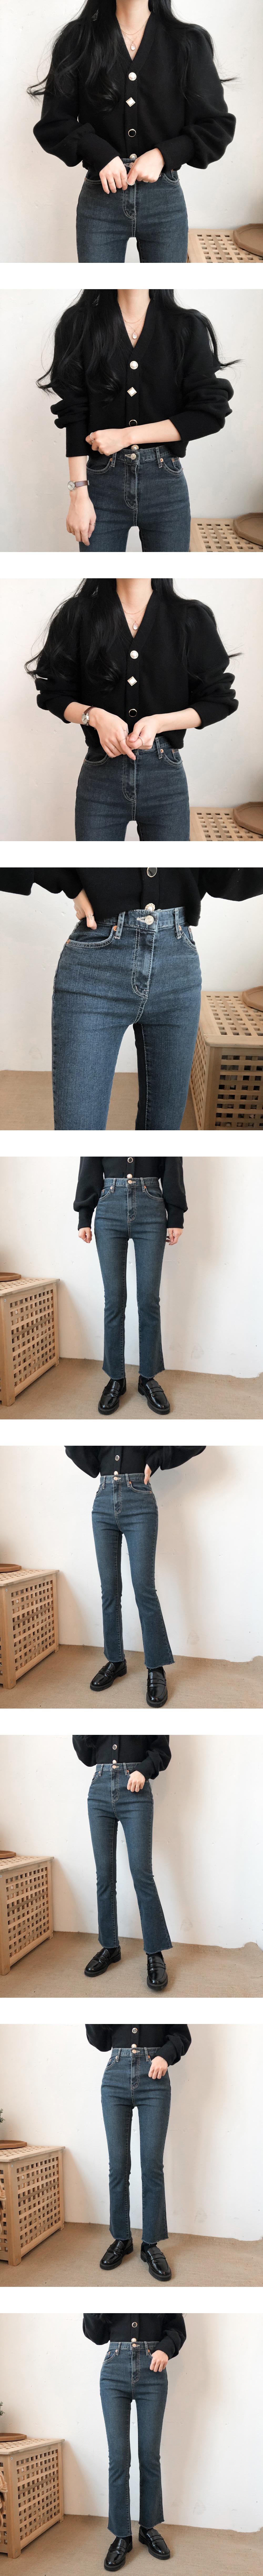 9529 semi-boots cutting denim pants